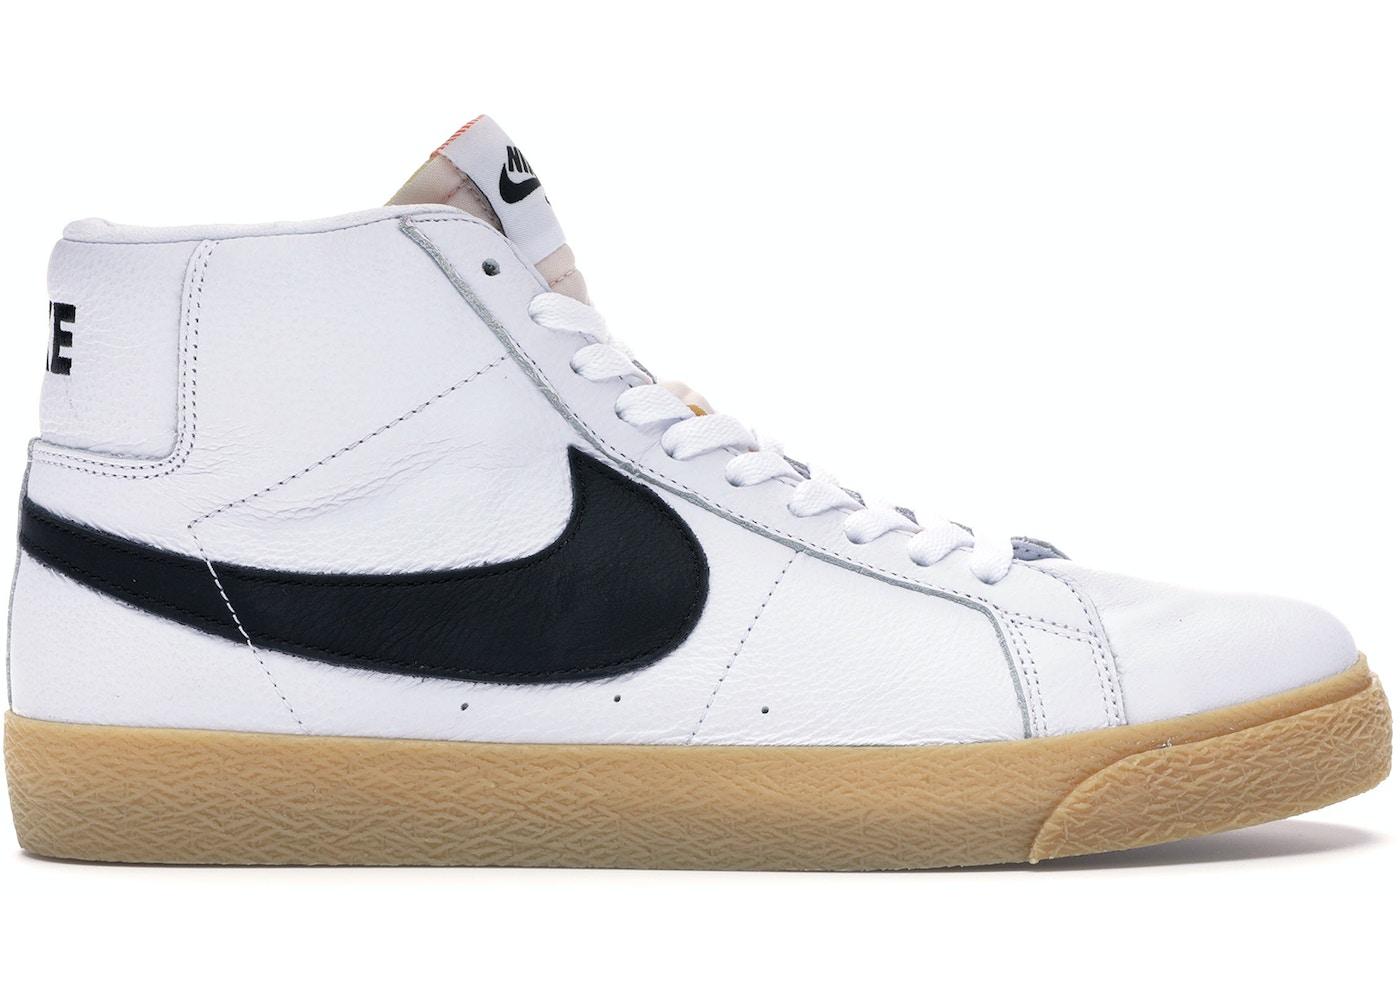 Campeonato Frank Worthley esta ahí  Nike SB Zoom Blazer Mid ISO Orange Label White Gum - CD2569-100